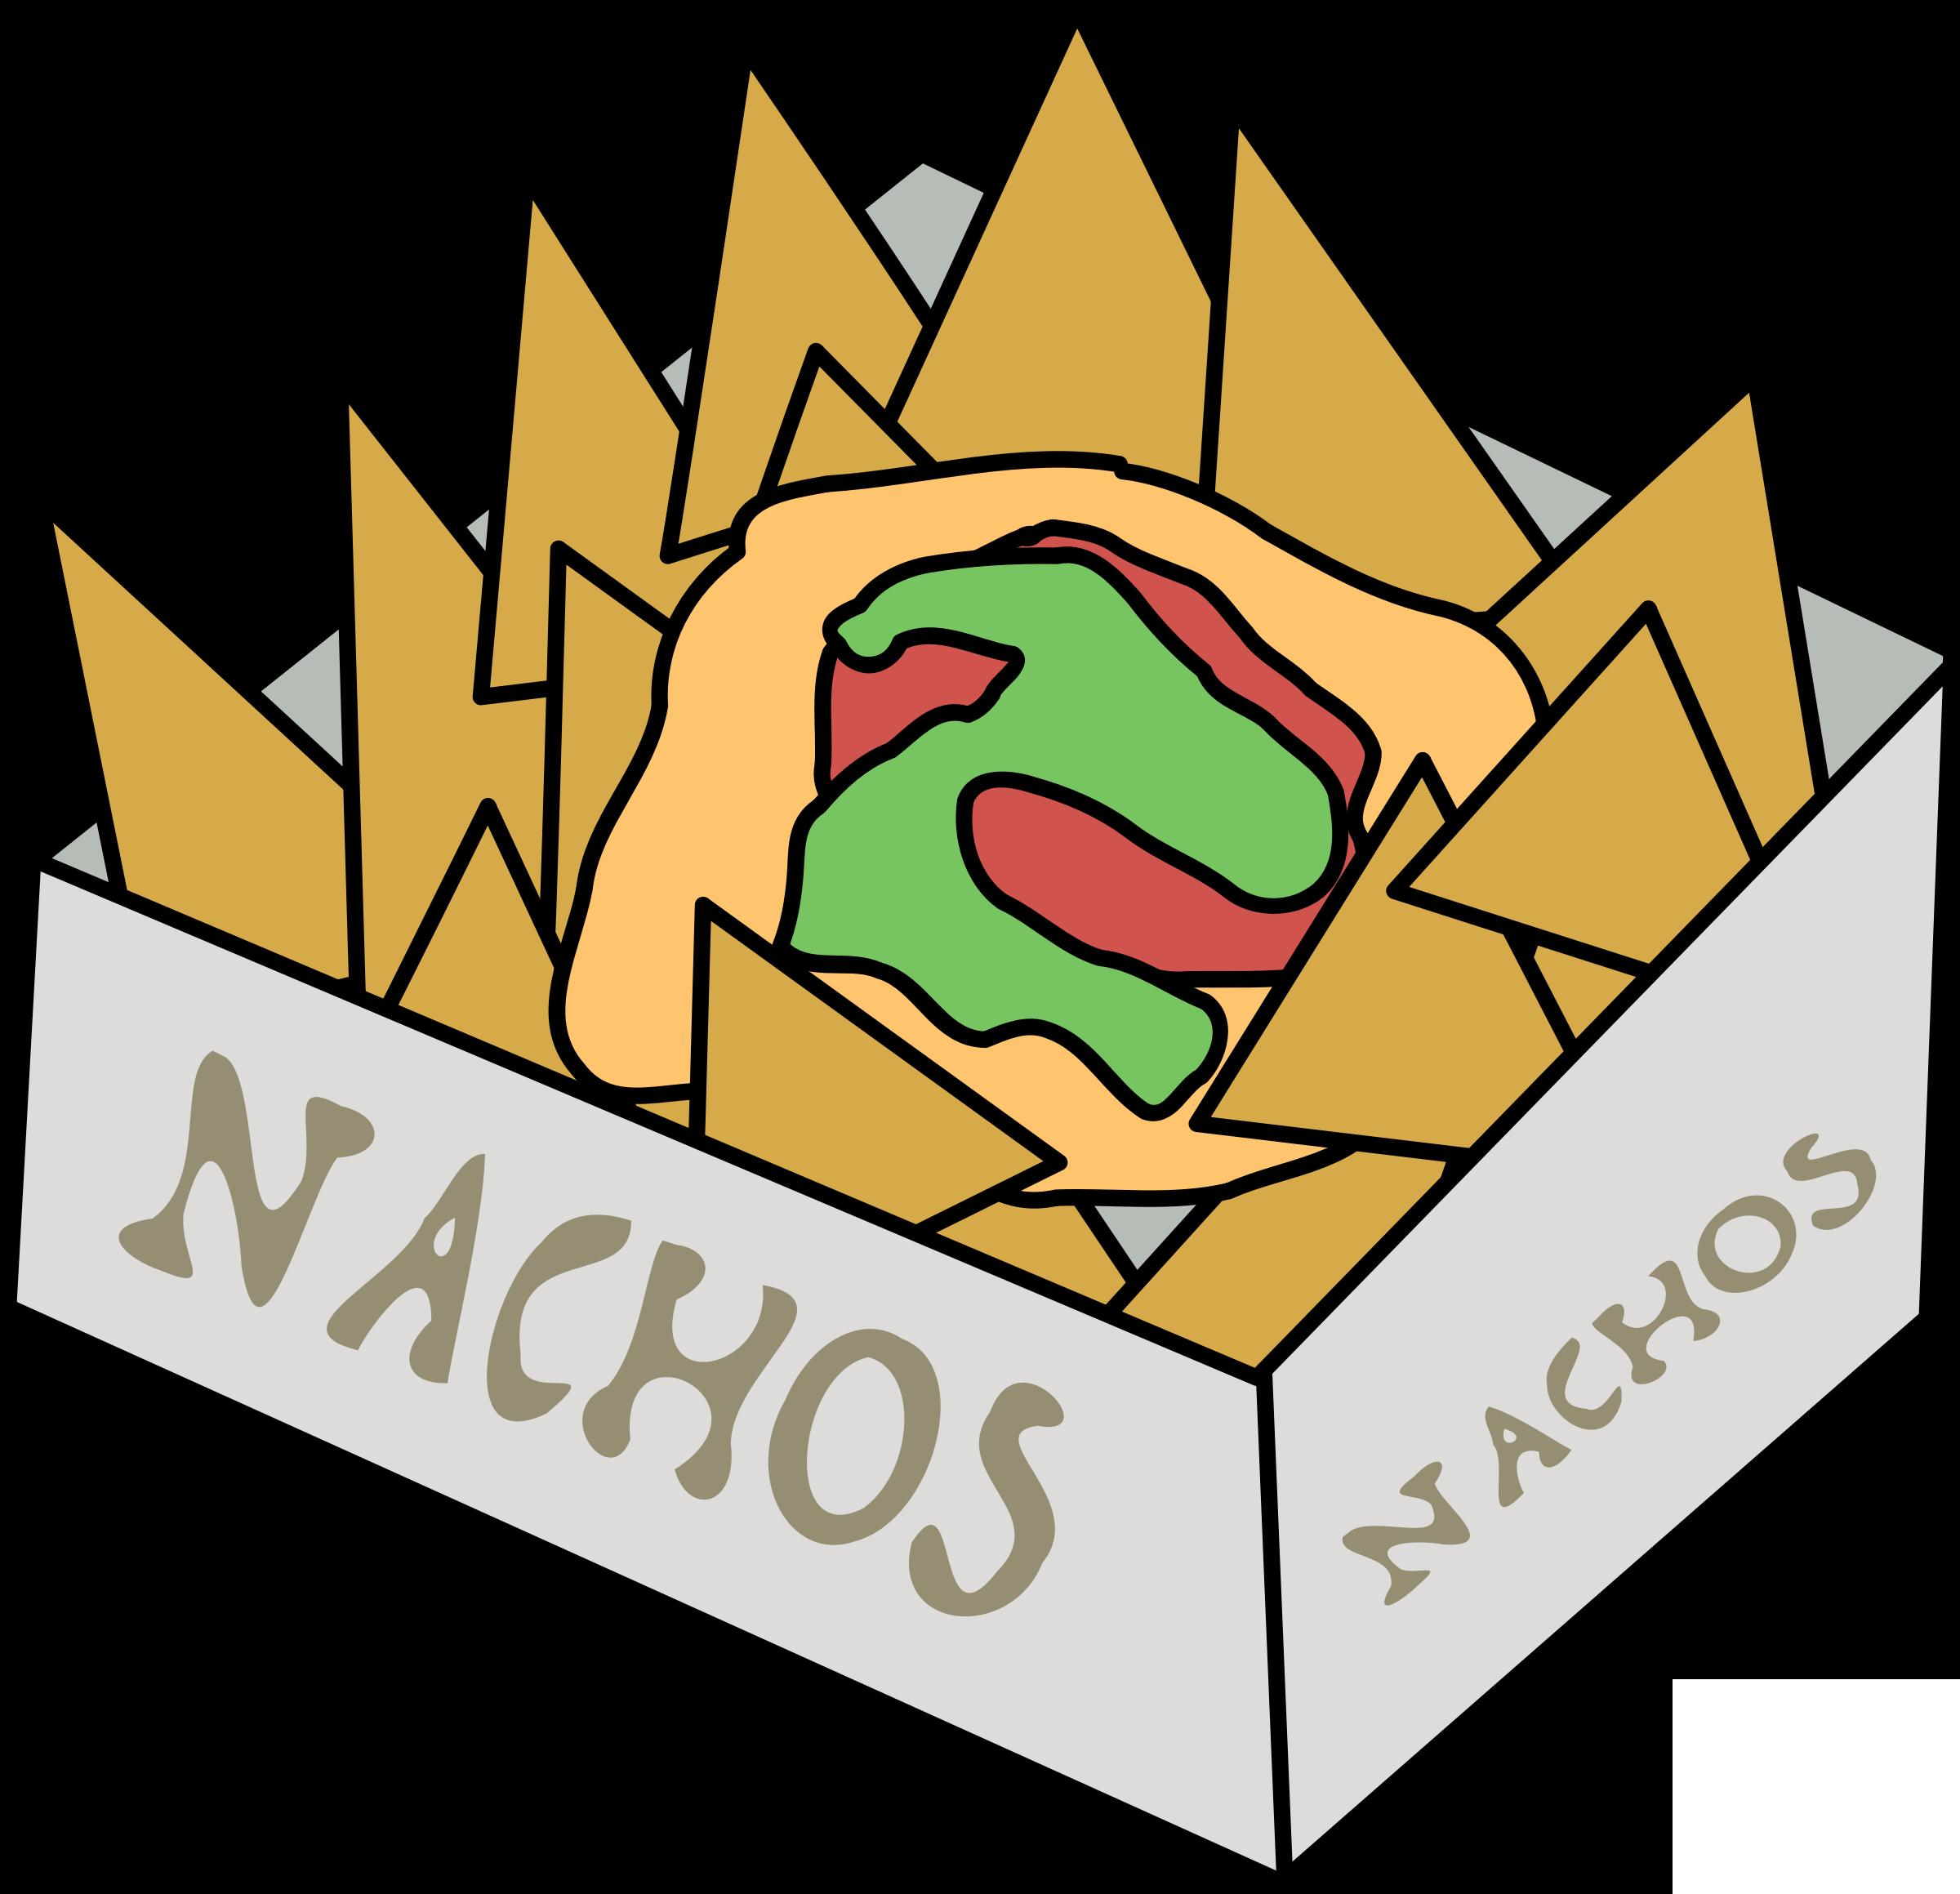 Box of Nachos Vector Clipart image.